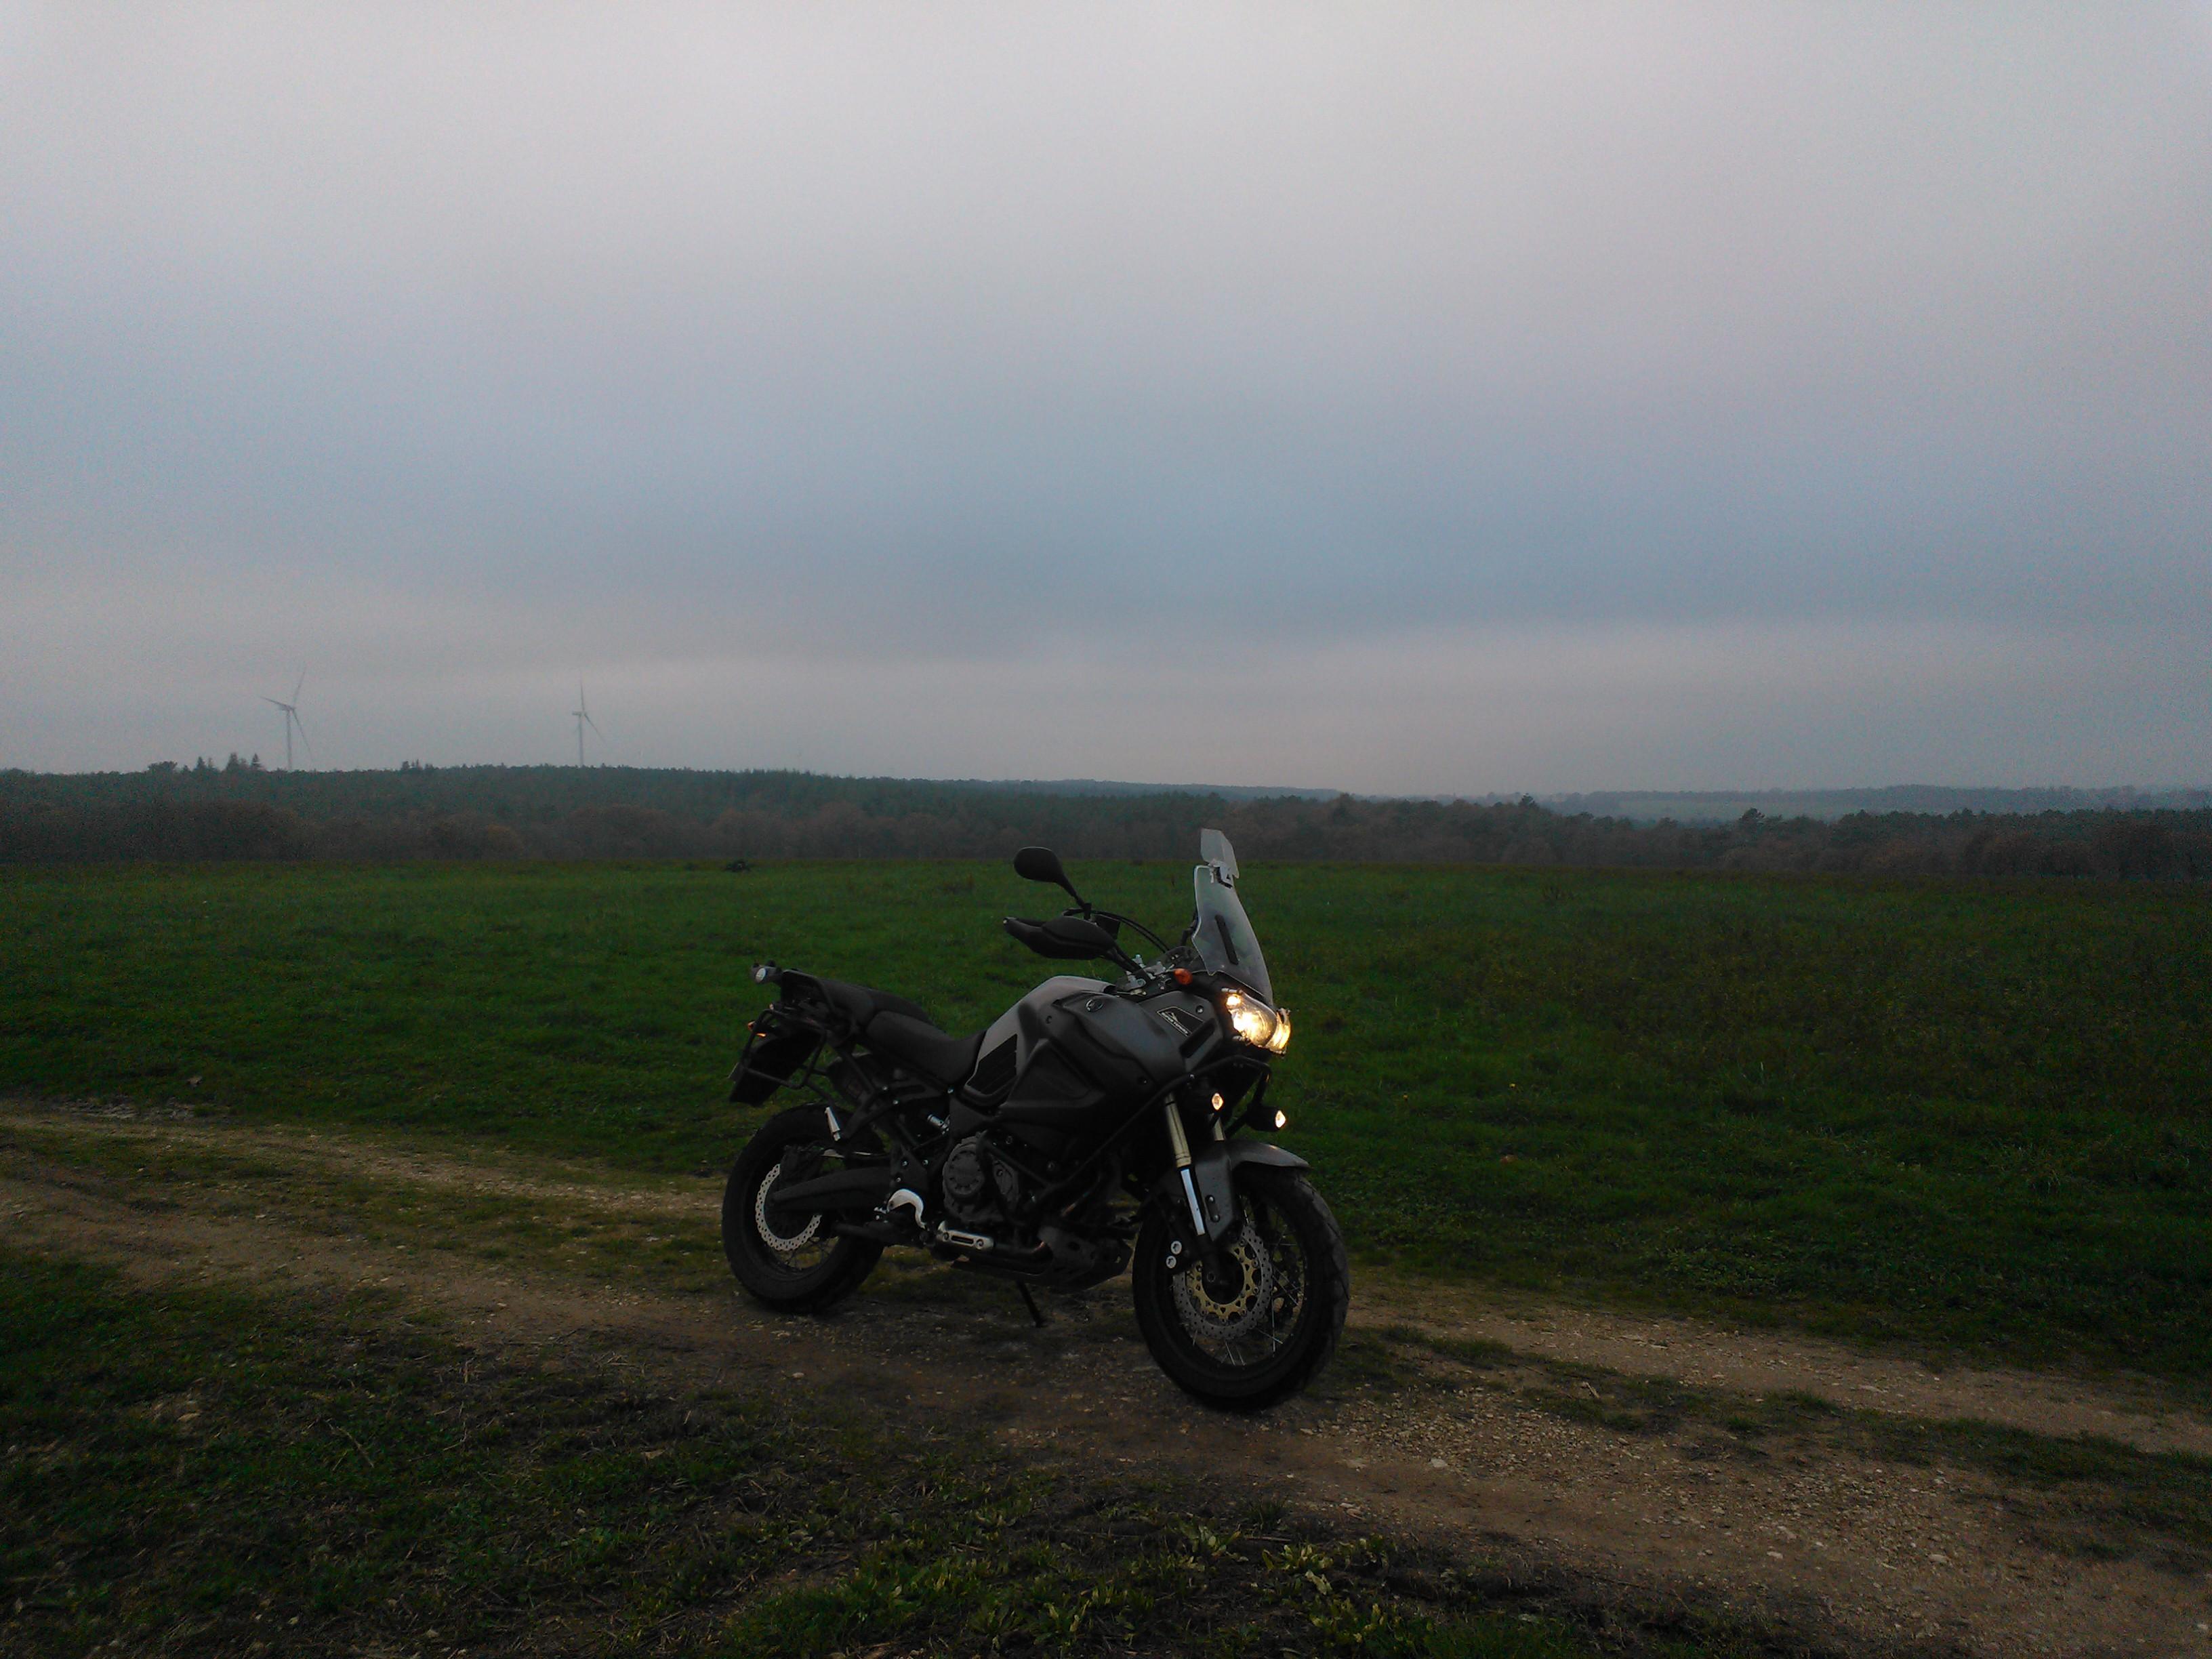 Balade dans les champs en Bretagne 503410WP201411301